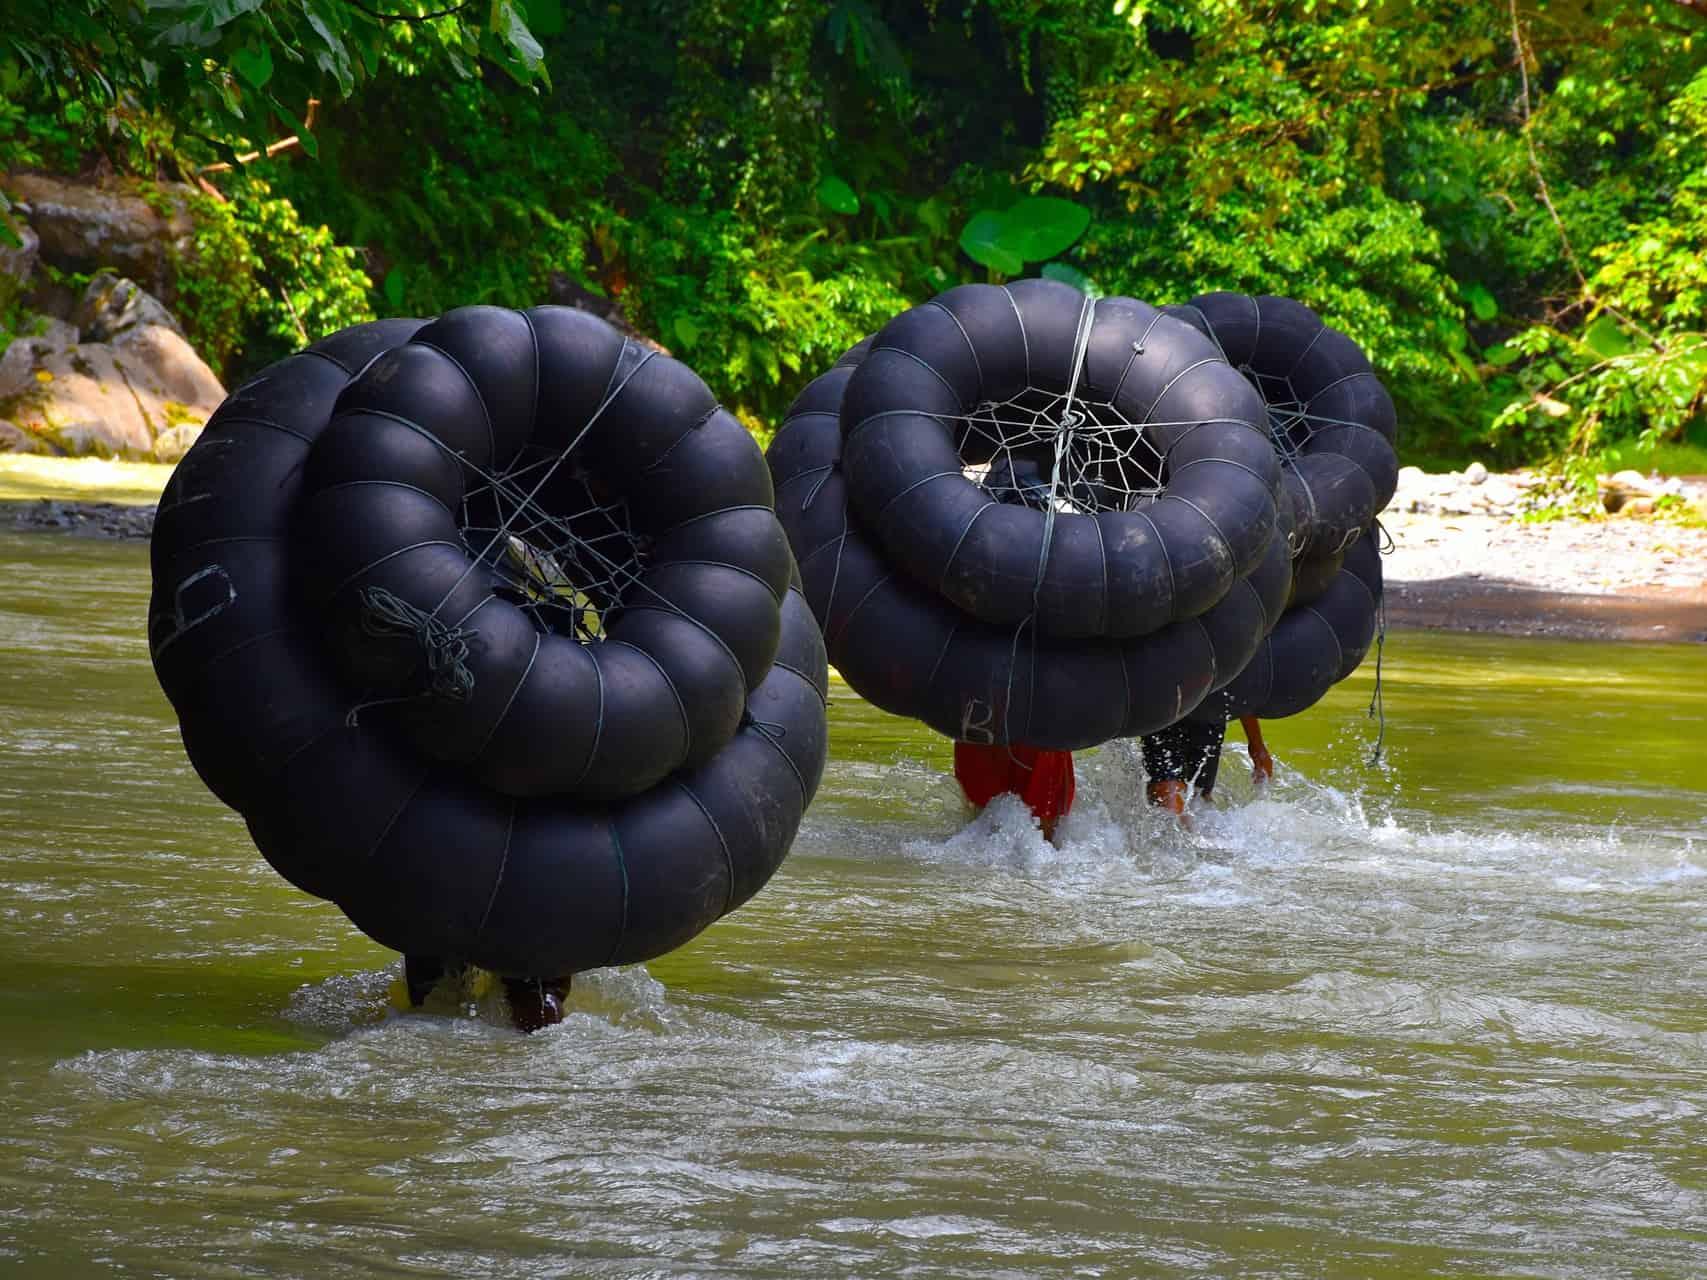 BUKIT LAWANG TUBE PORTER - SUMATRA ECOTRAVEL